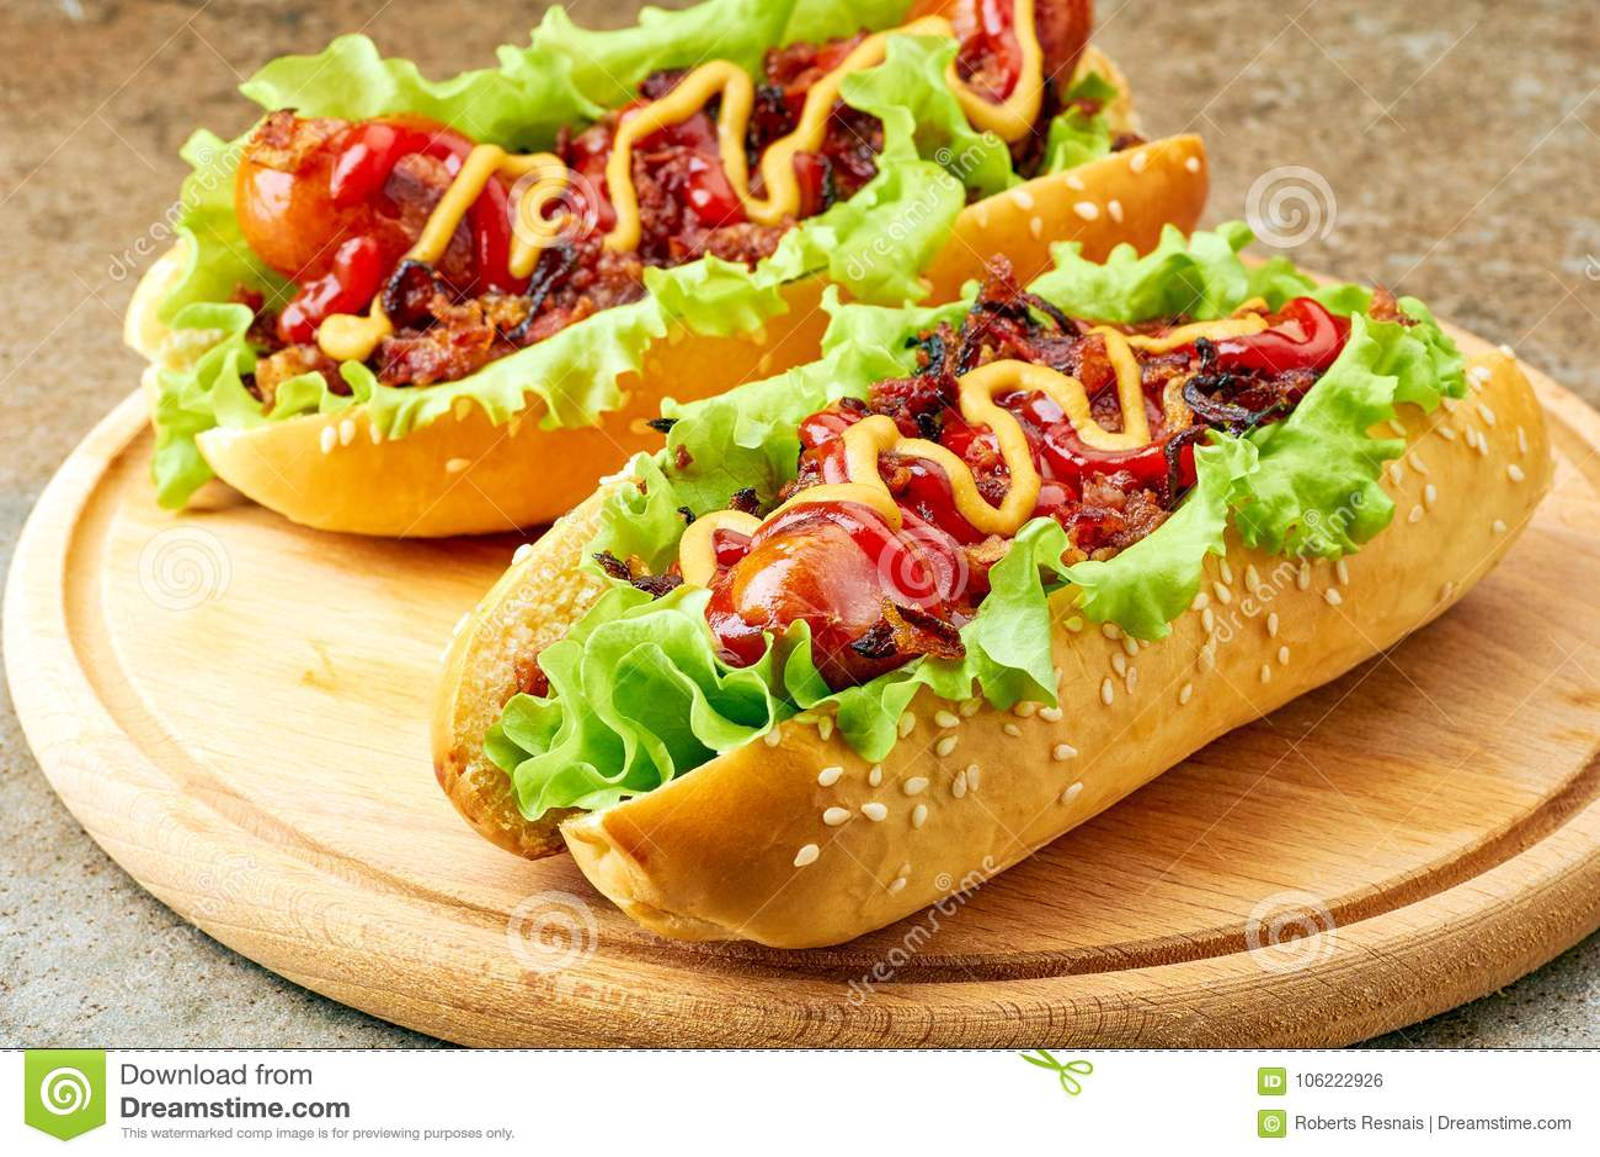 Dois cachorros quentes caseiros com coberturas da alface, do bacon e da cebola